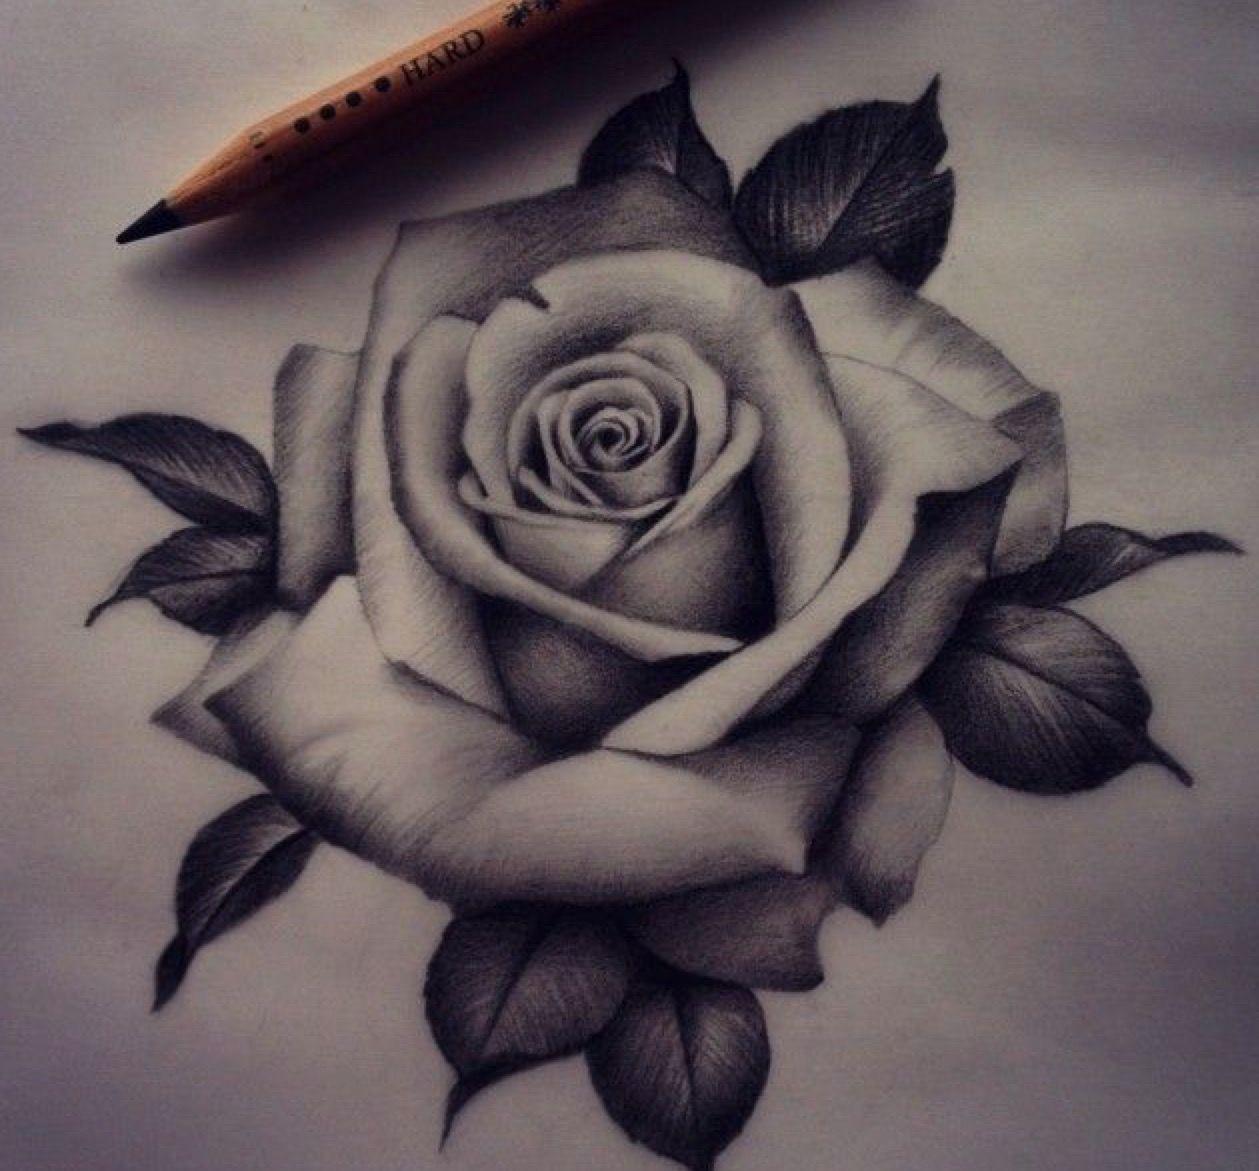 pin by randi aliquo on leg tattoo rose tattoos tattoos realistic rose tattoo. Black Bedroom Furniture Sets. Home Design Ideas